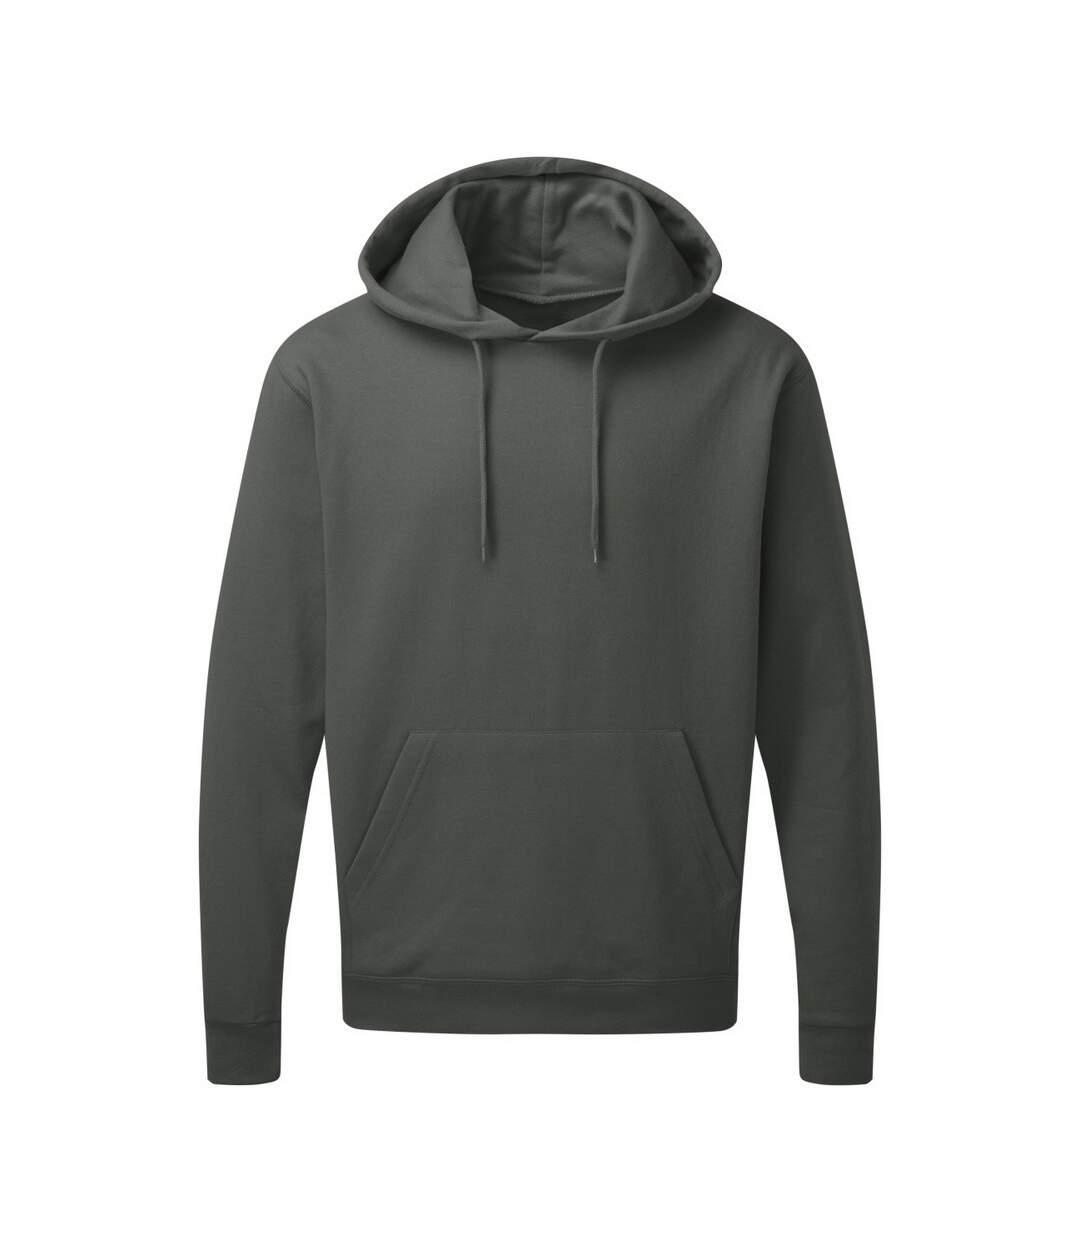 SG Mens Plain Hooded Sweatshirt Top / Hoodie (Charcoal) - UTBC1072